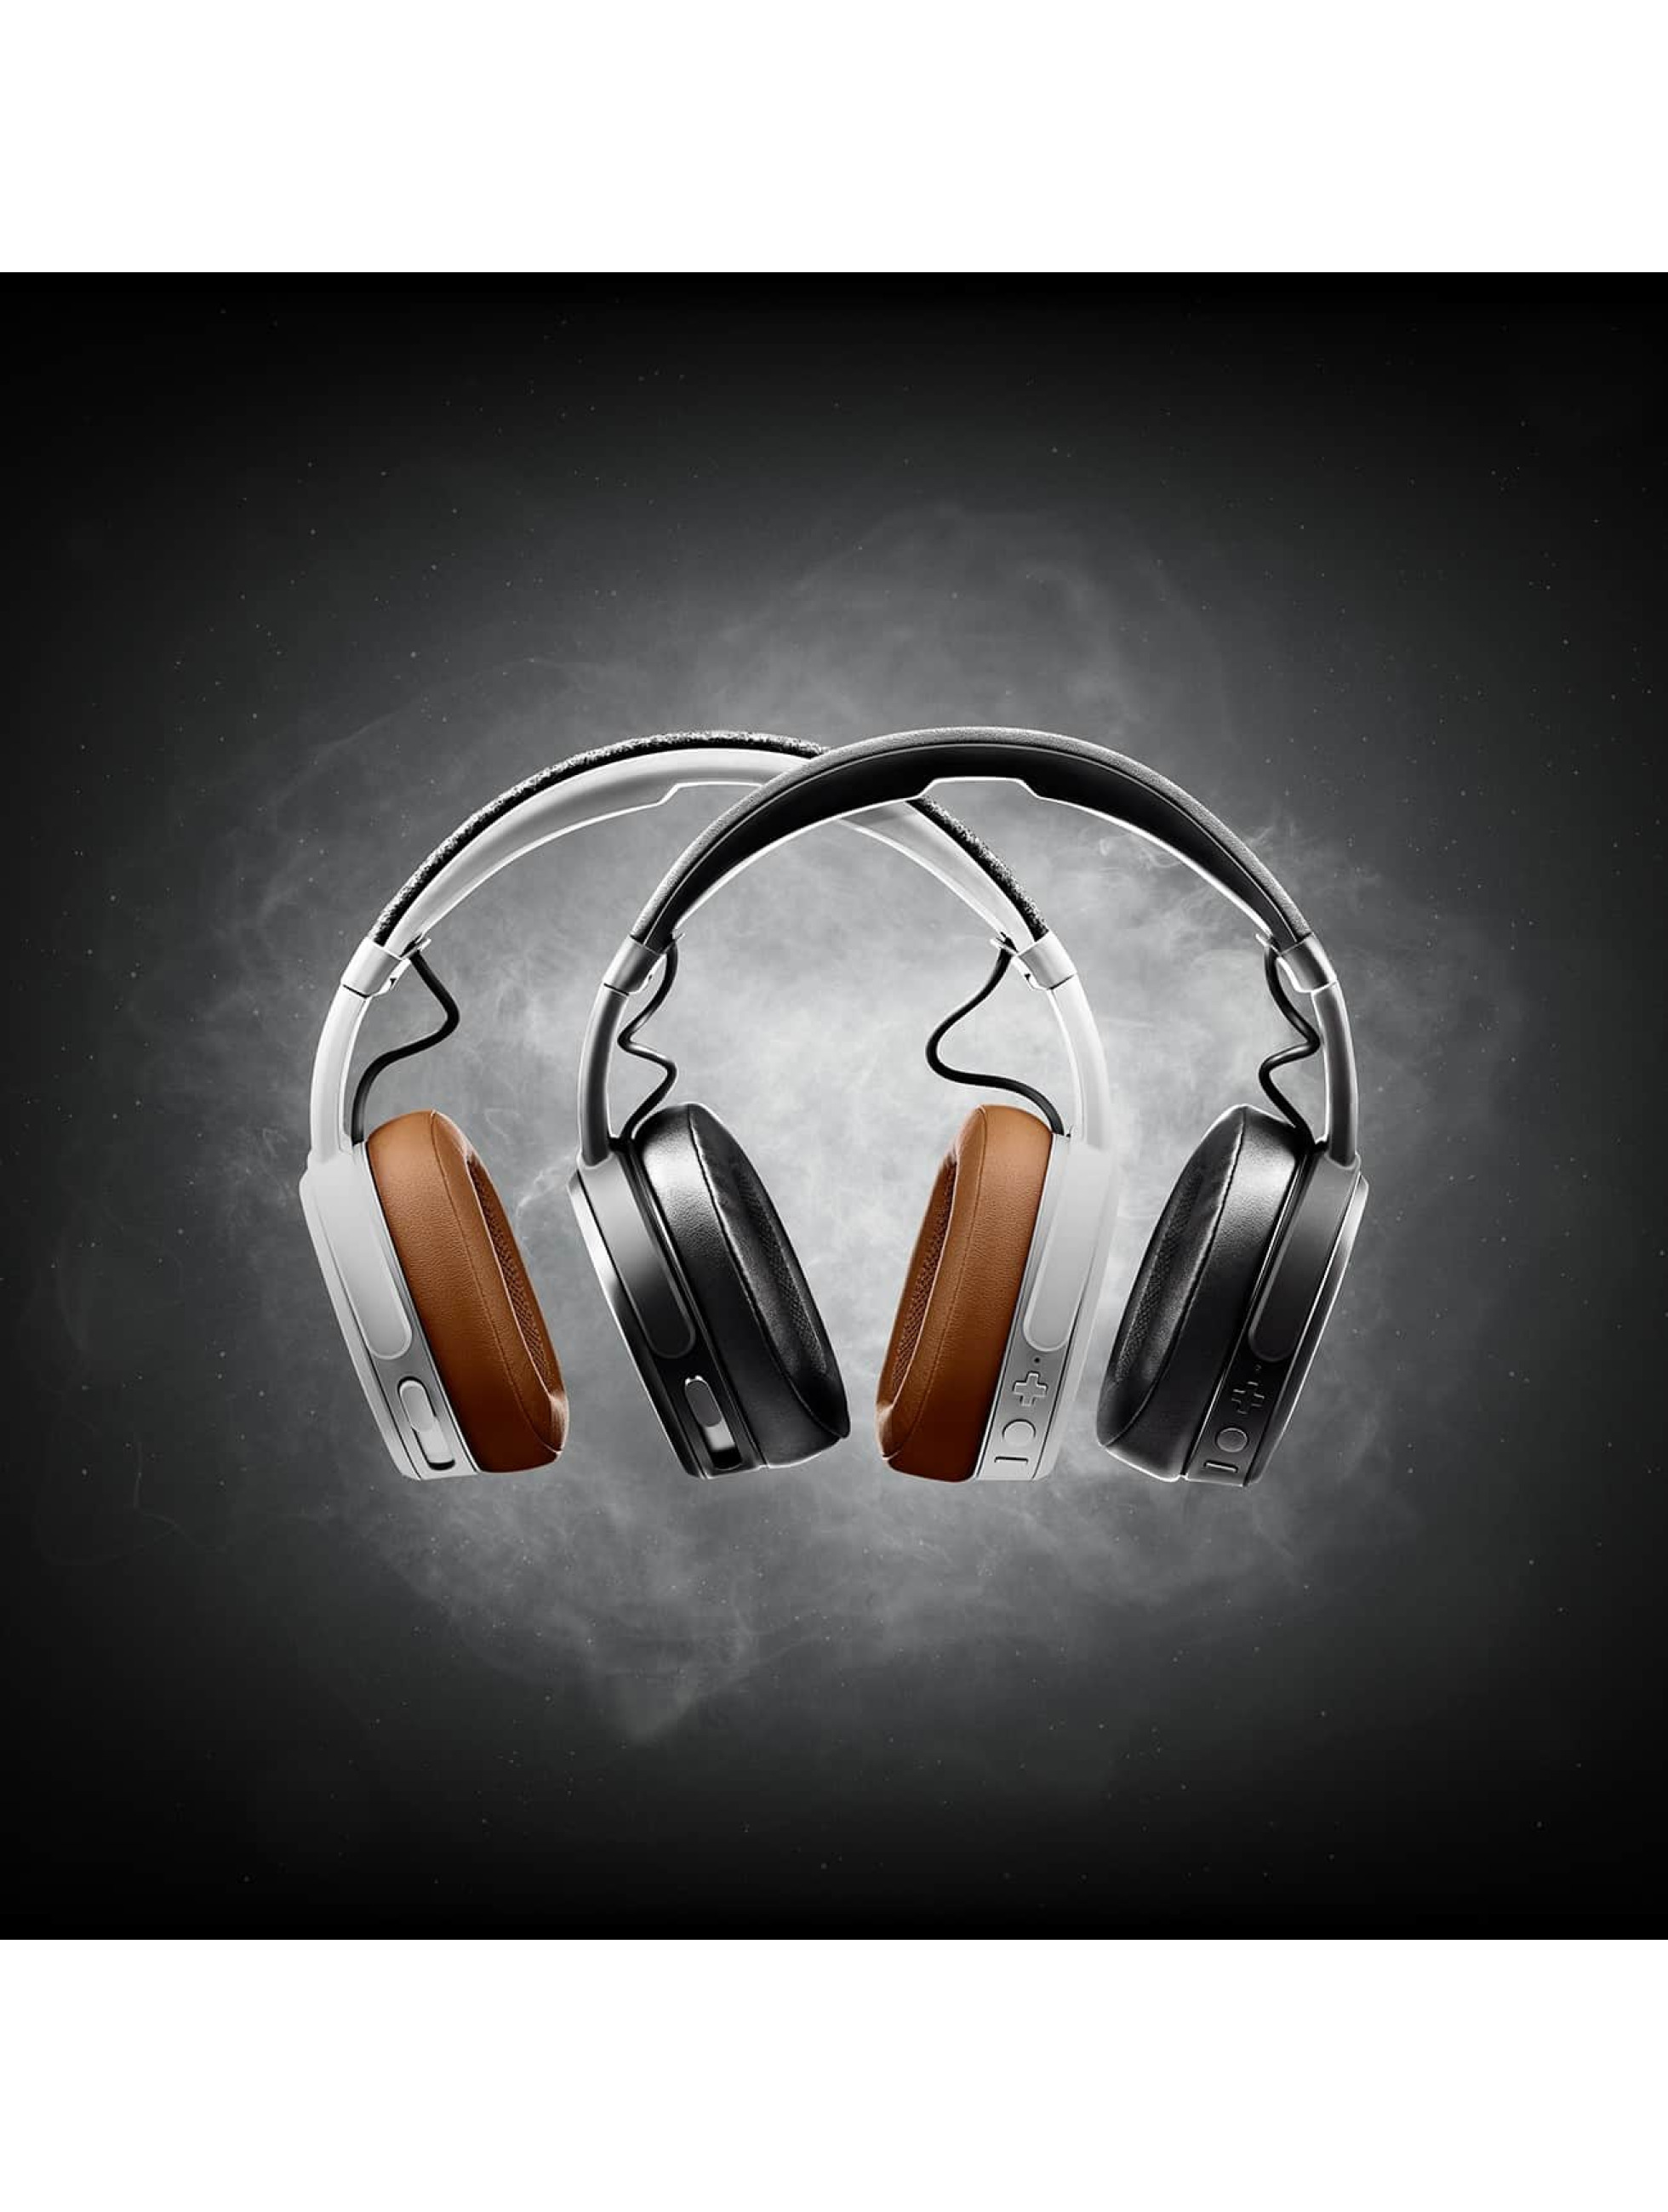 Skullcandy Sluchátka Crusher Wireless Over Ear èierna